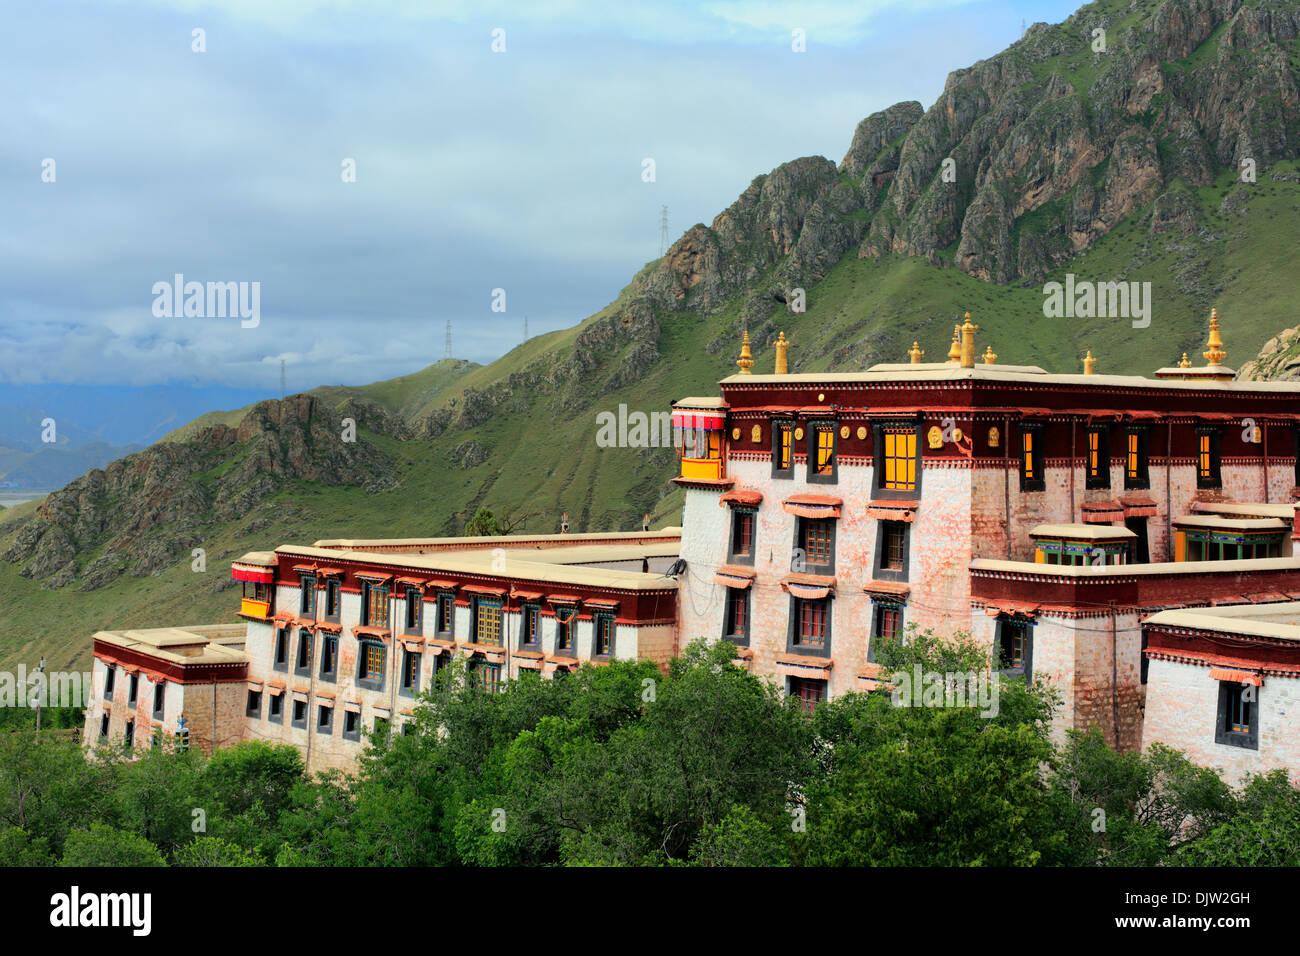 Drepung monastery, Mount Gephel, Lhasa Prefecture, Tibet, China - Stock Image